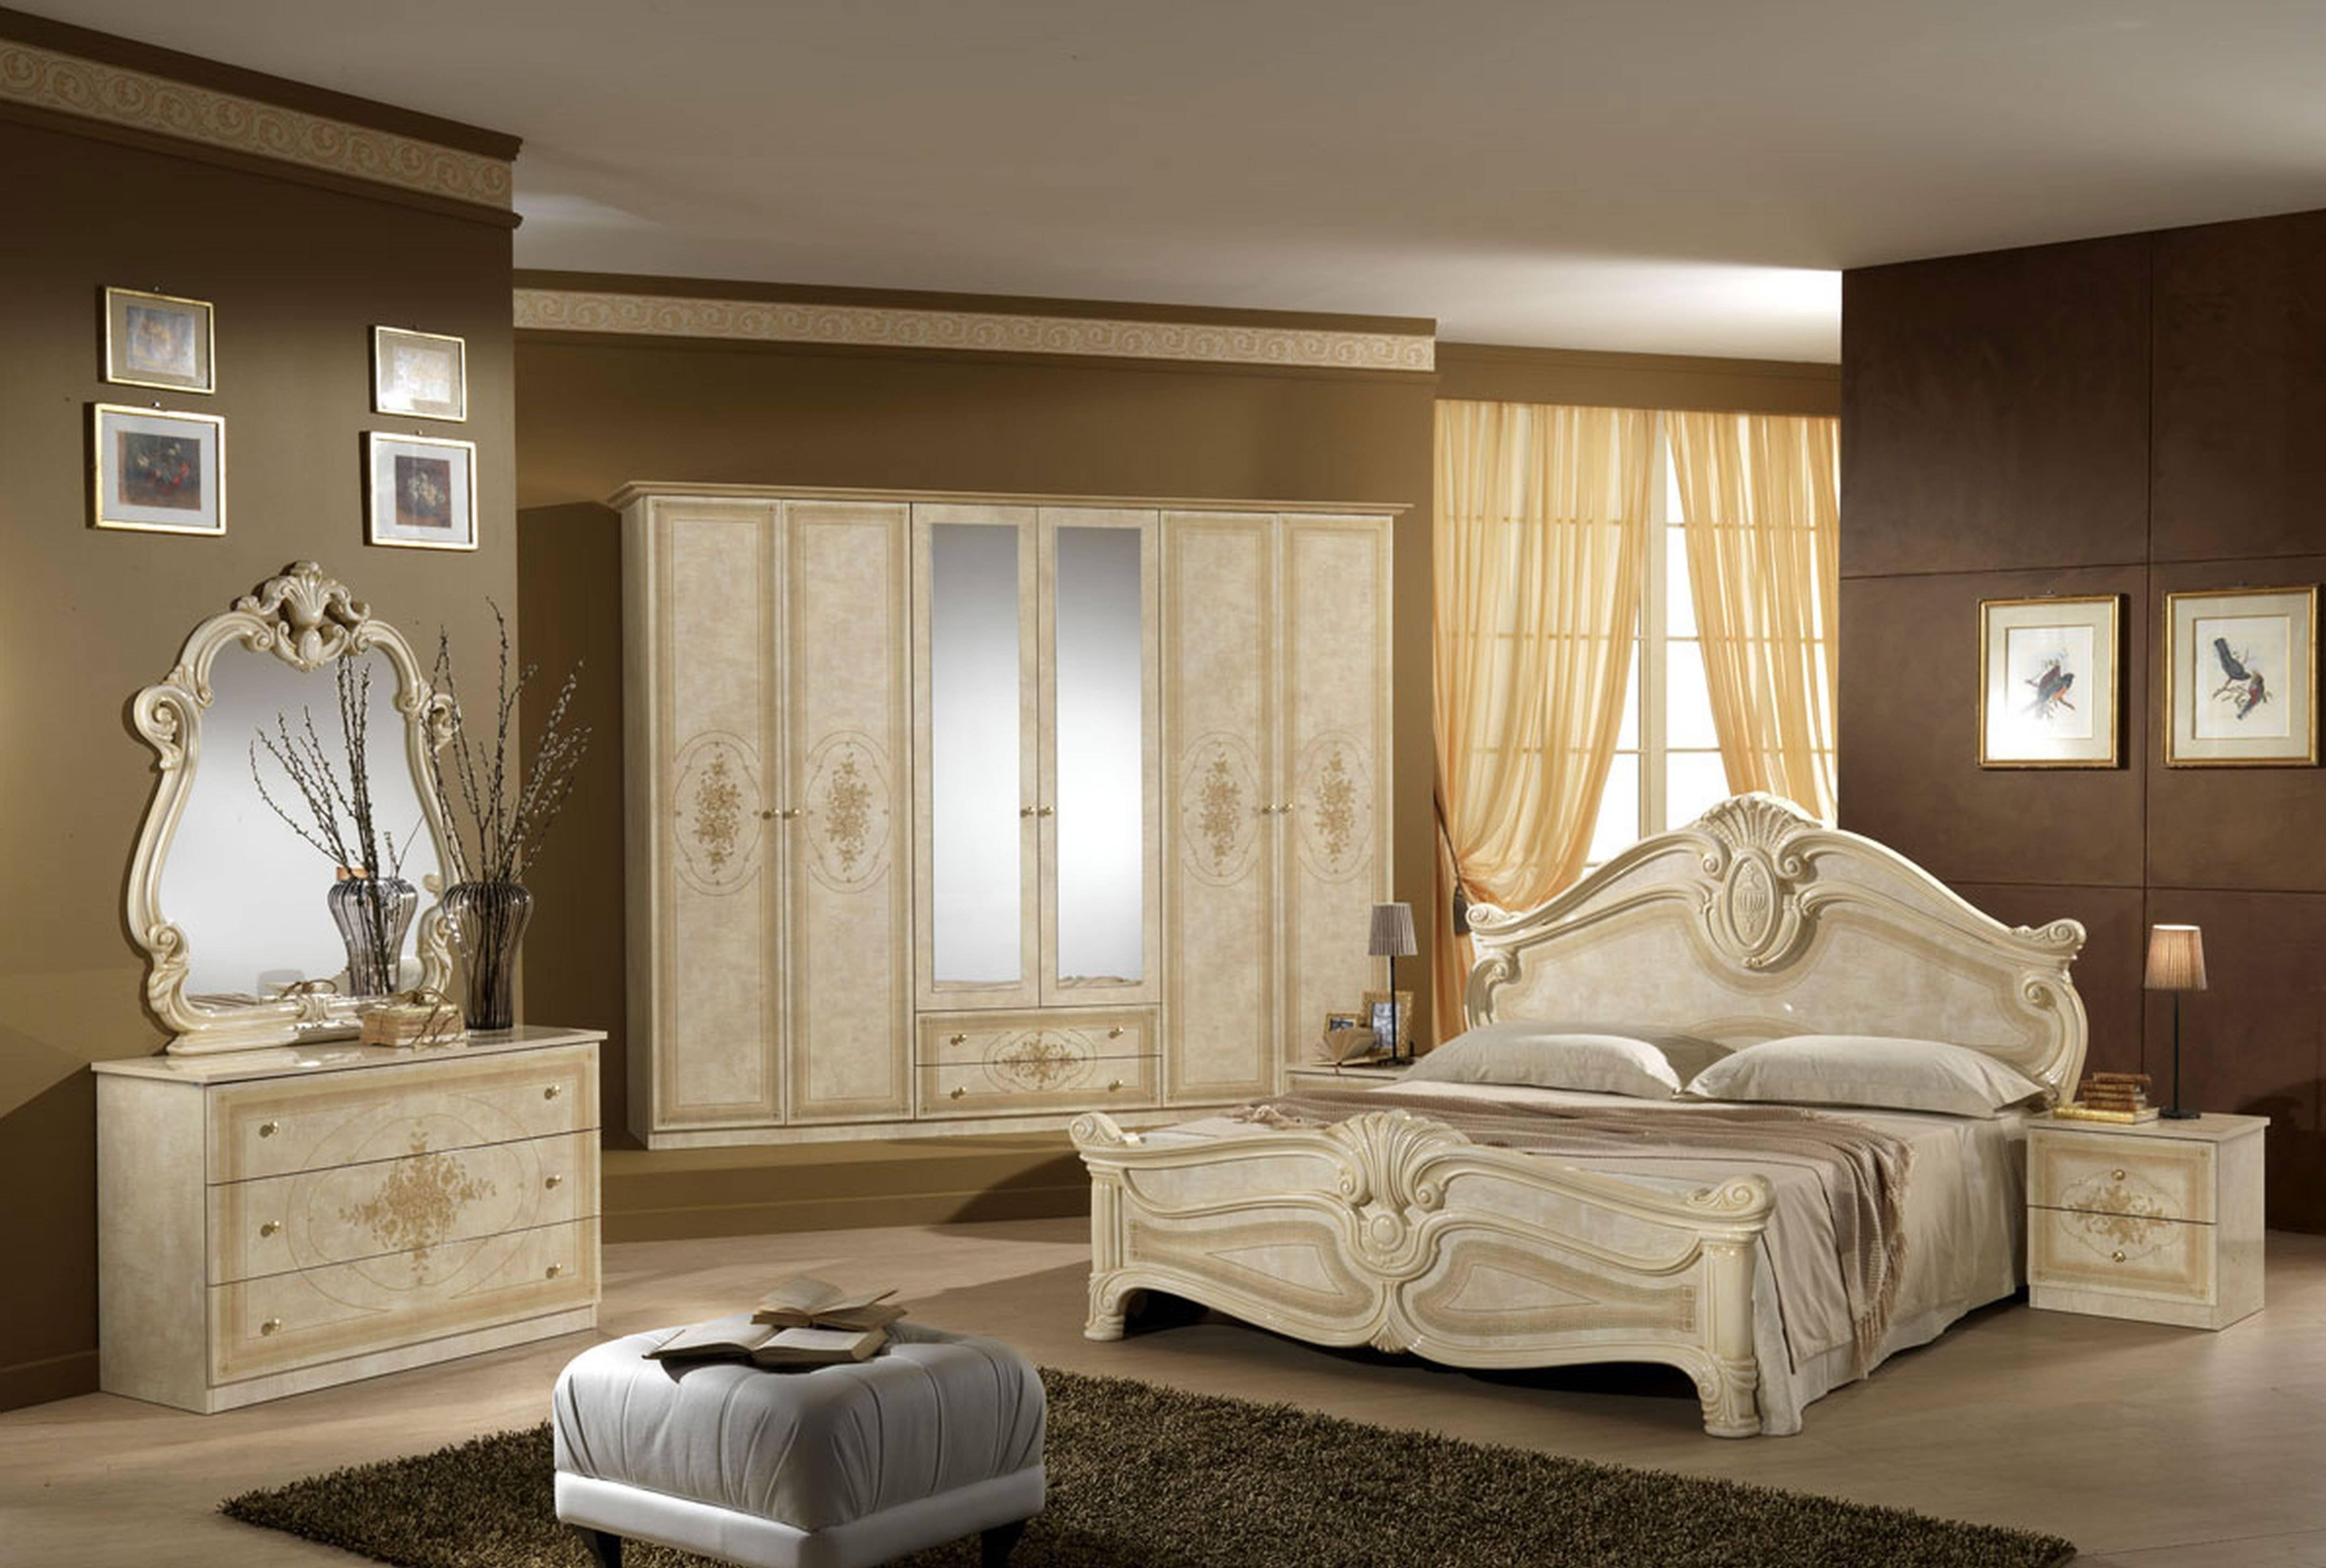 Bedroom Furniture : Purple Glossy Elegant Bedroom Armoire Modern within Dark Wood Wardrobe Sets (Image 16 of 30)